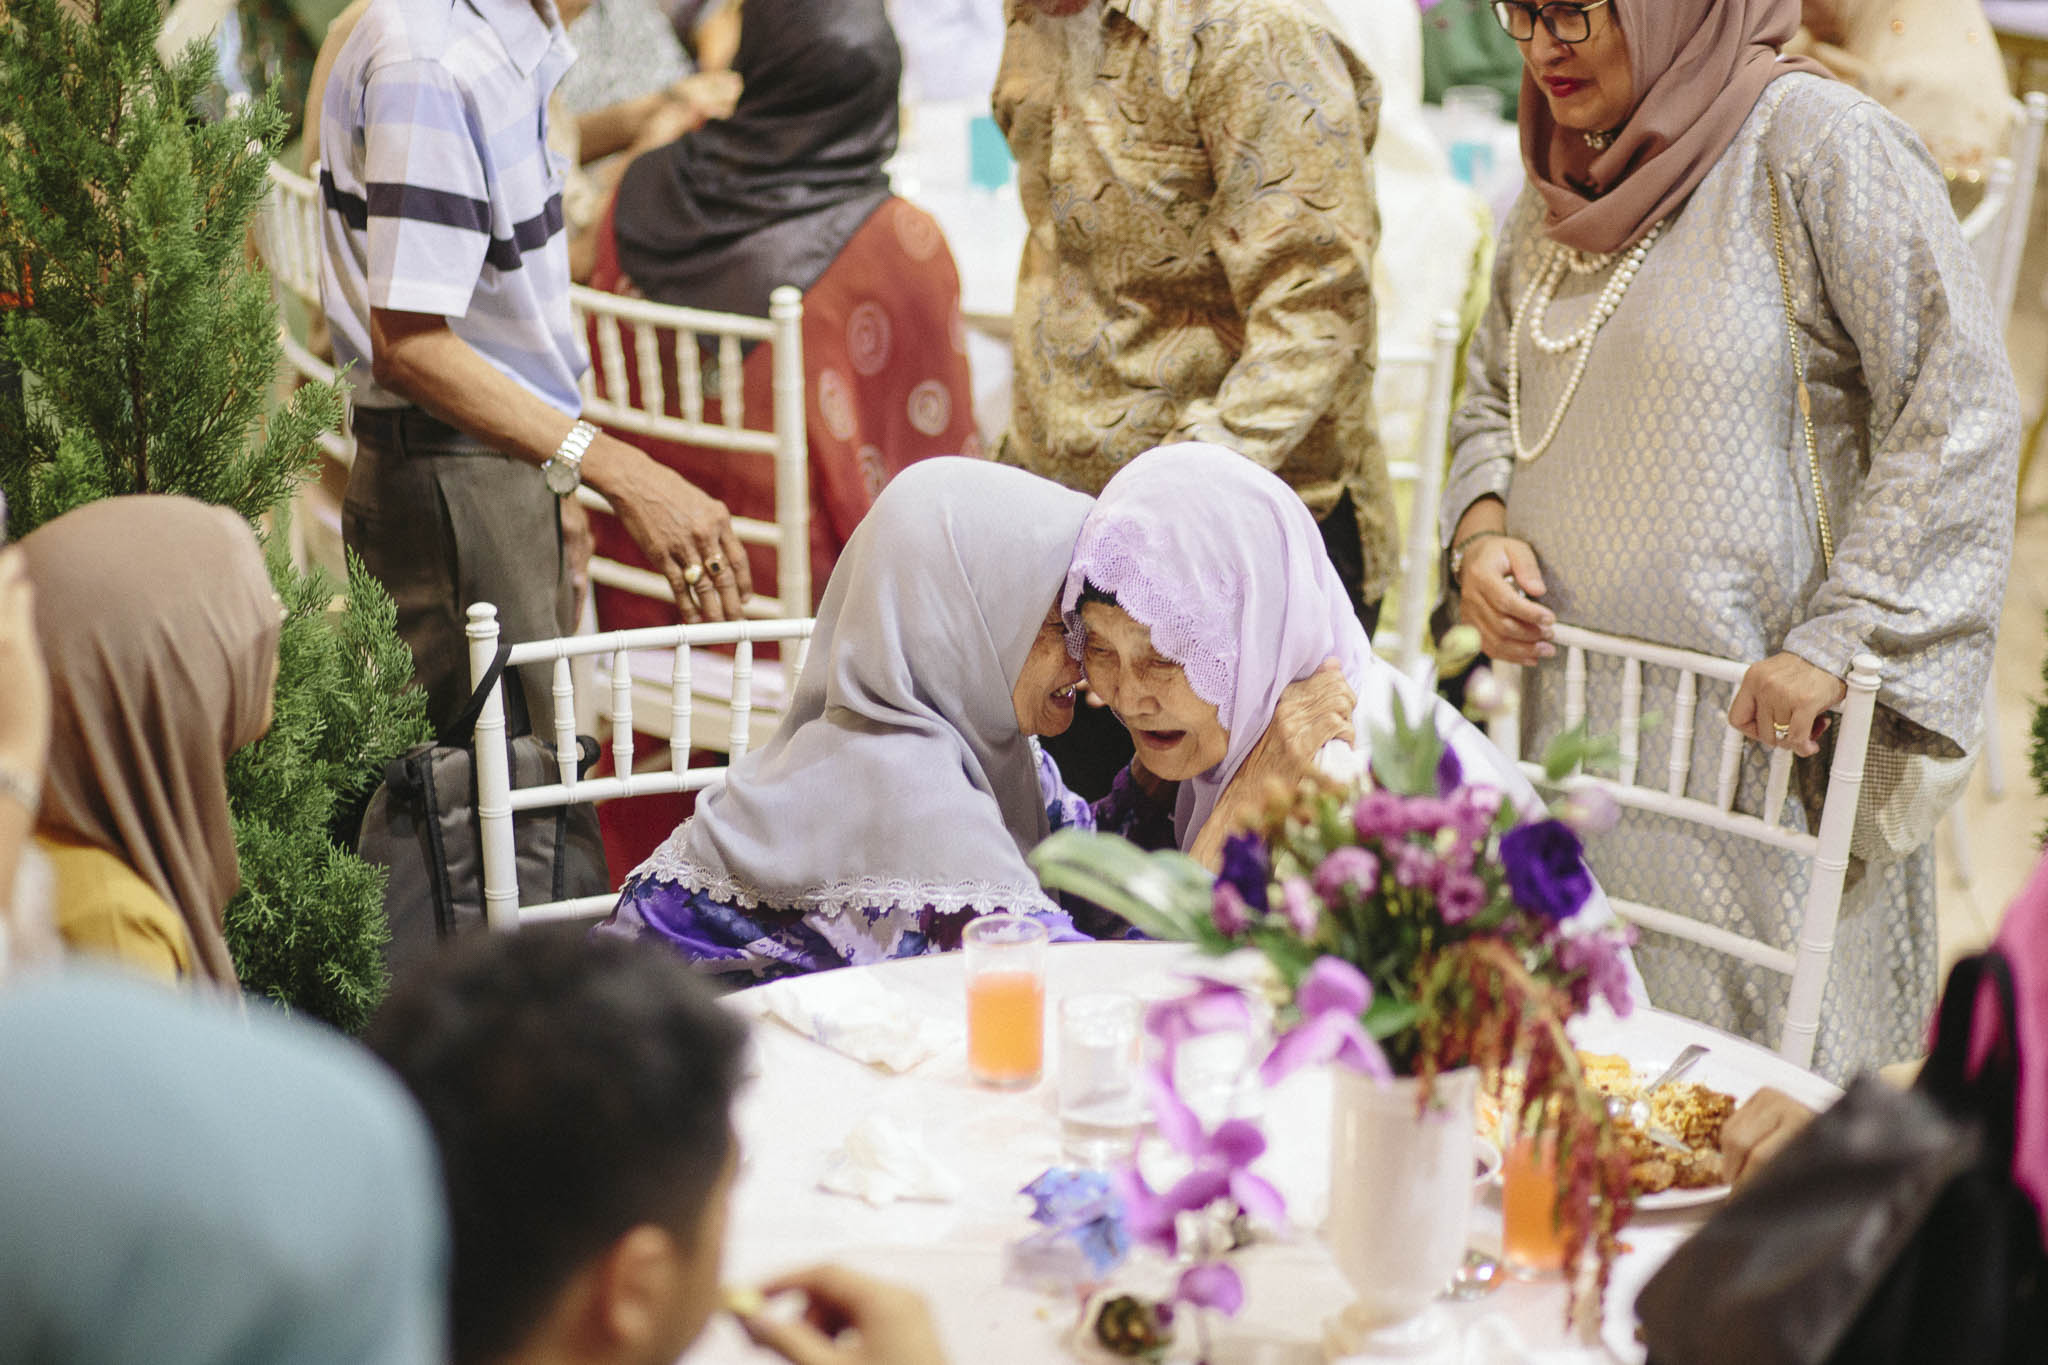 singapore-wedding-photographer-malay-indian-pre-wedding-travel-wmt-2015-50.jpg